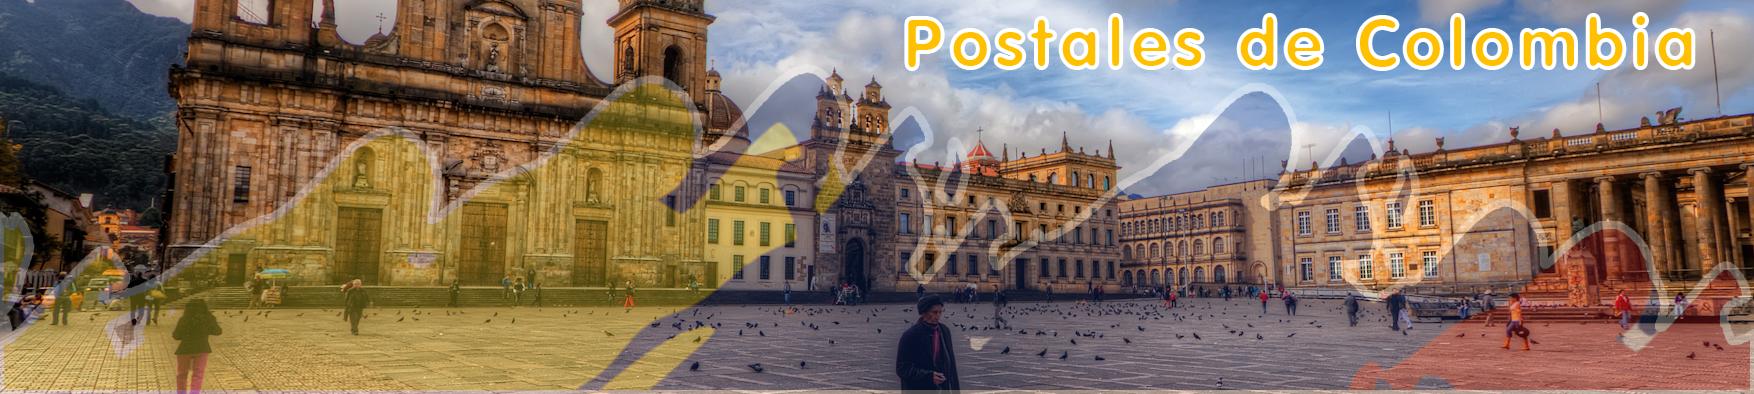 esColombia Postales